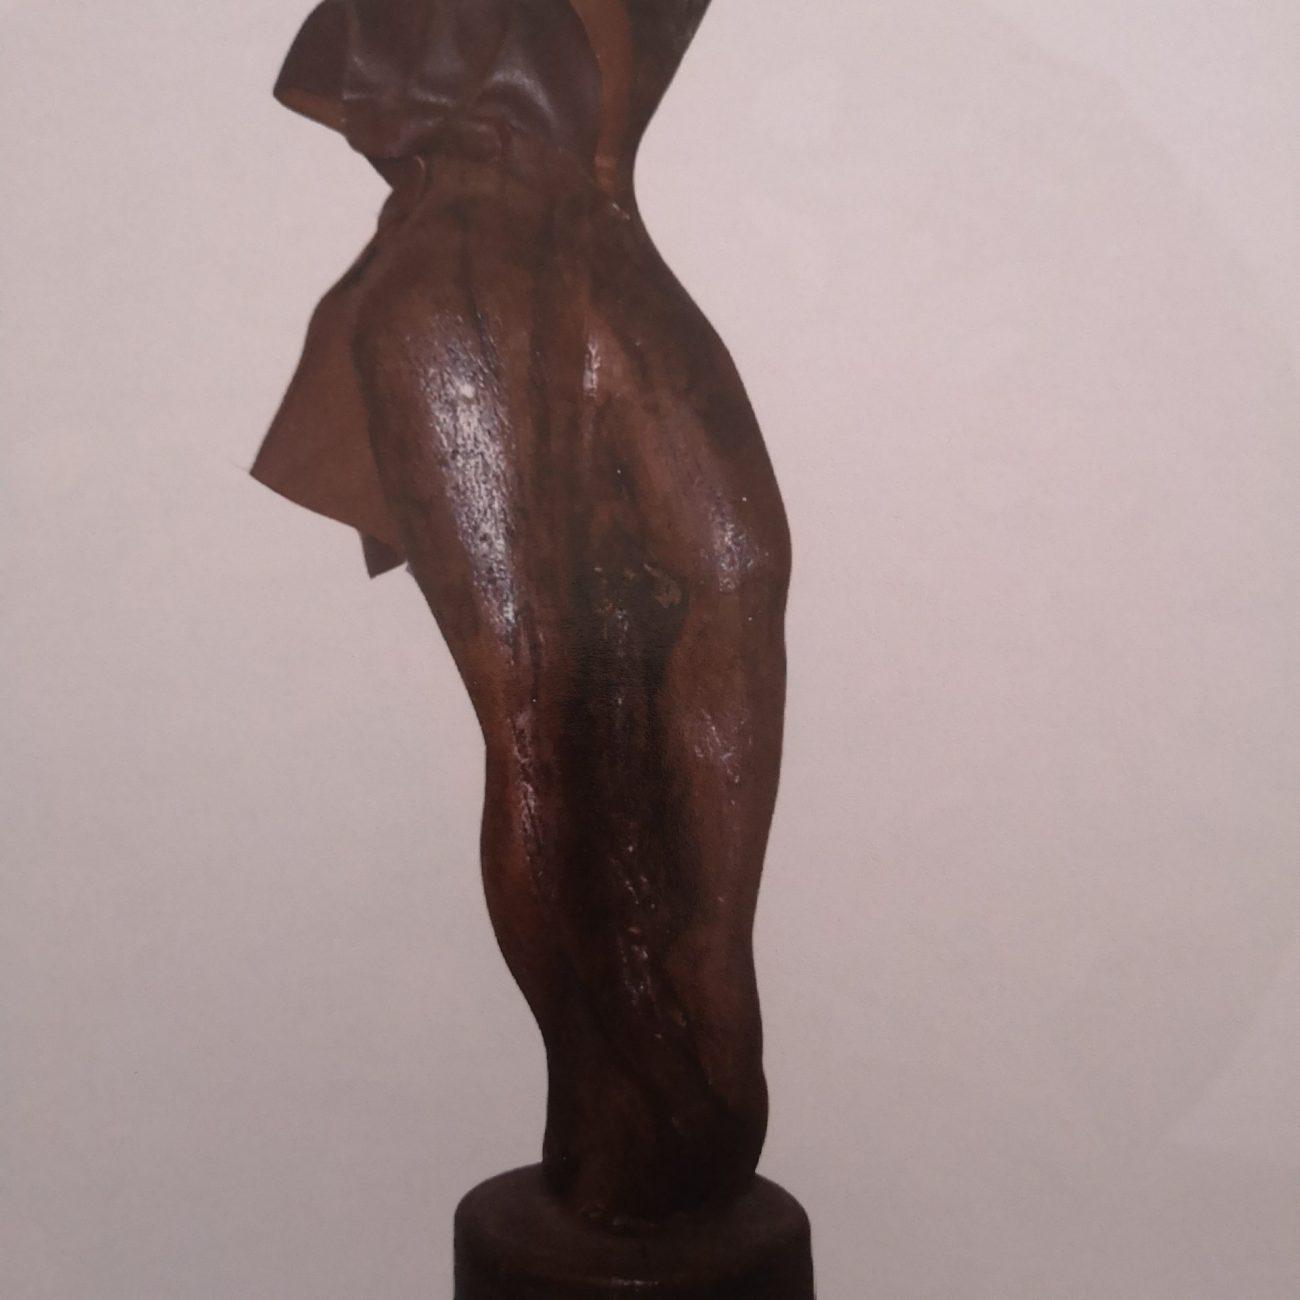 Manken Venüs  Teknik:Ceviz Ölçü:45x15x10 cm  Fiyat:6000 TL